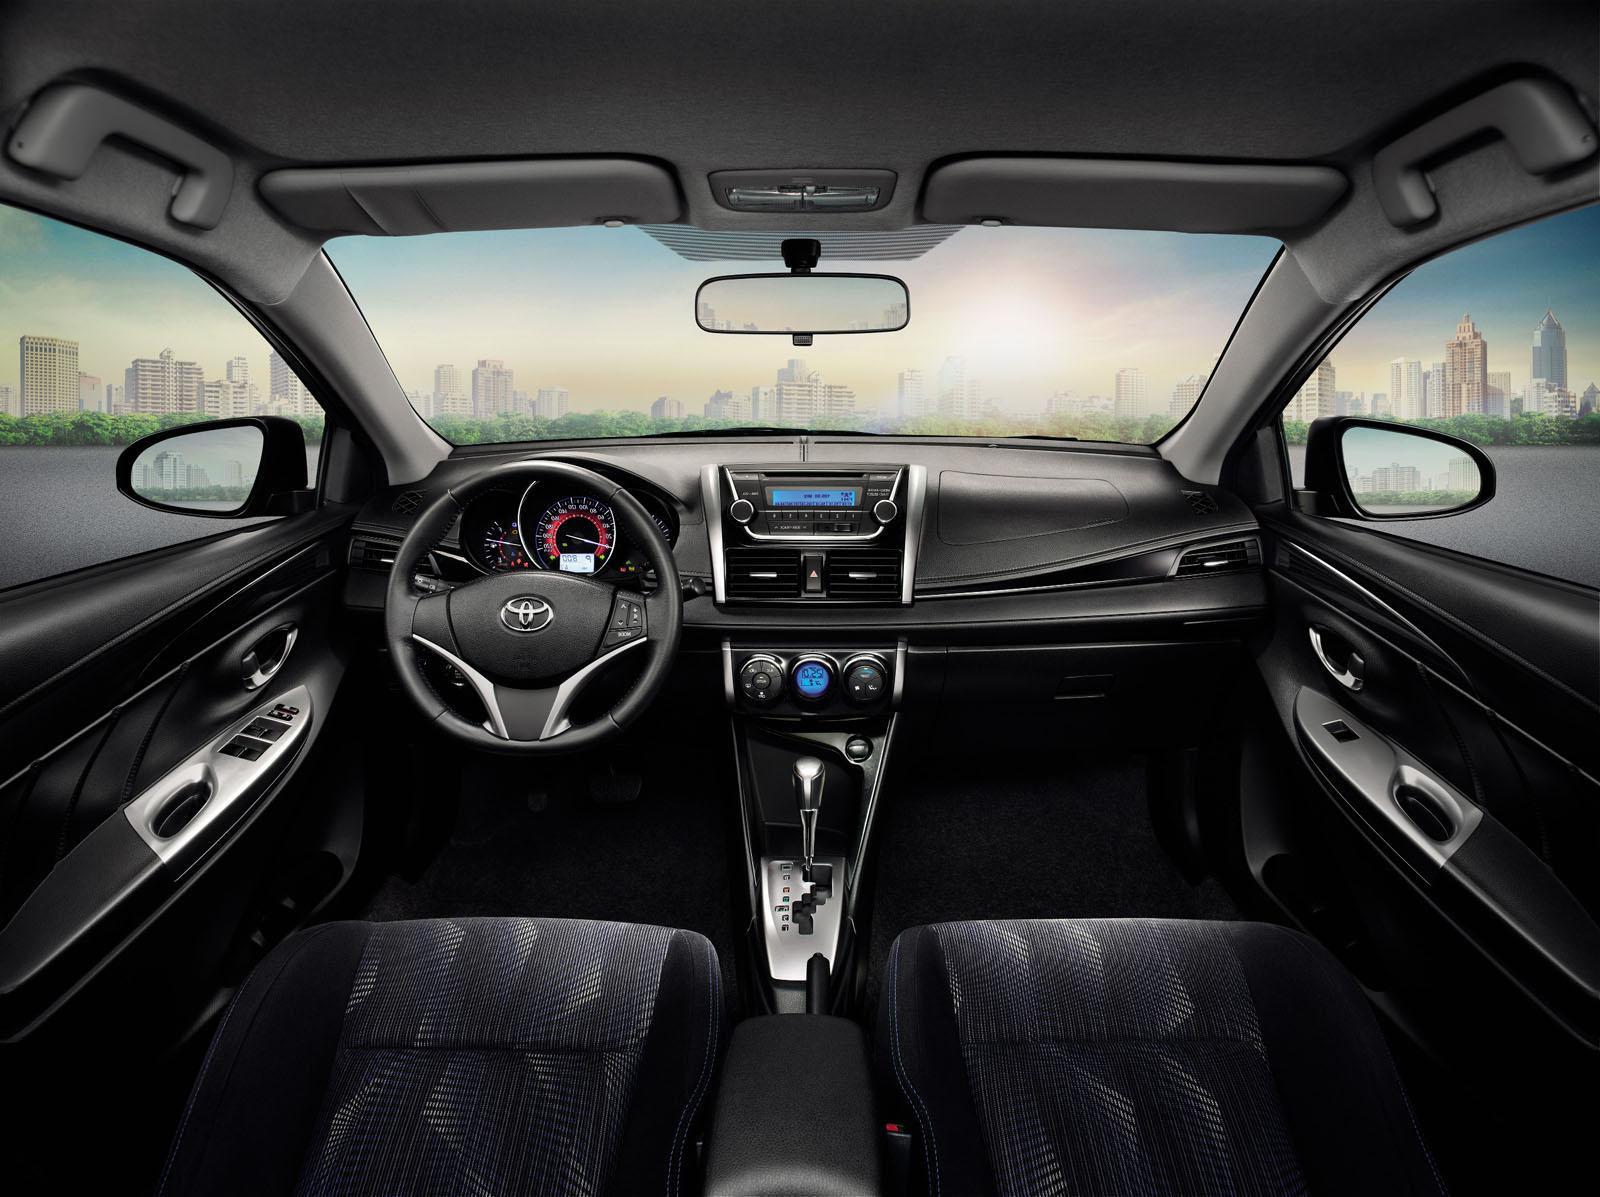 novo Toyota Vios 2014 interior